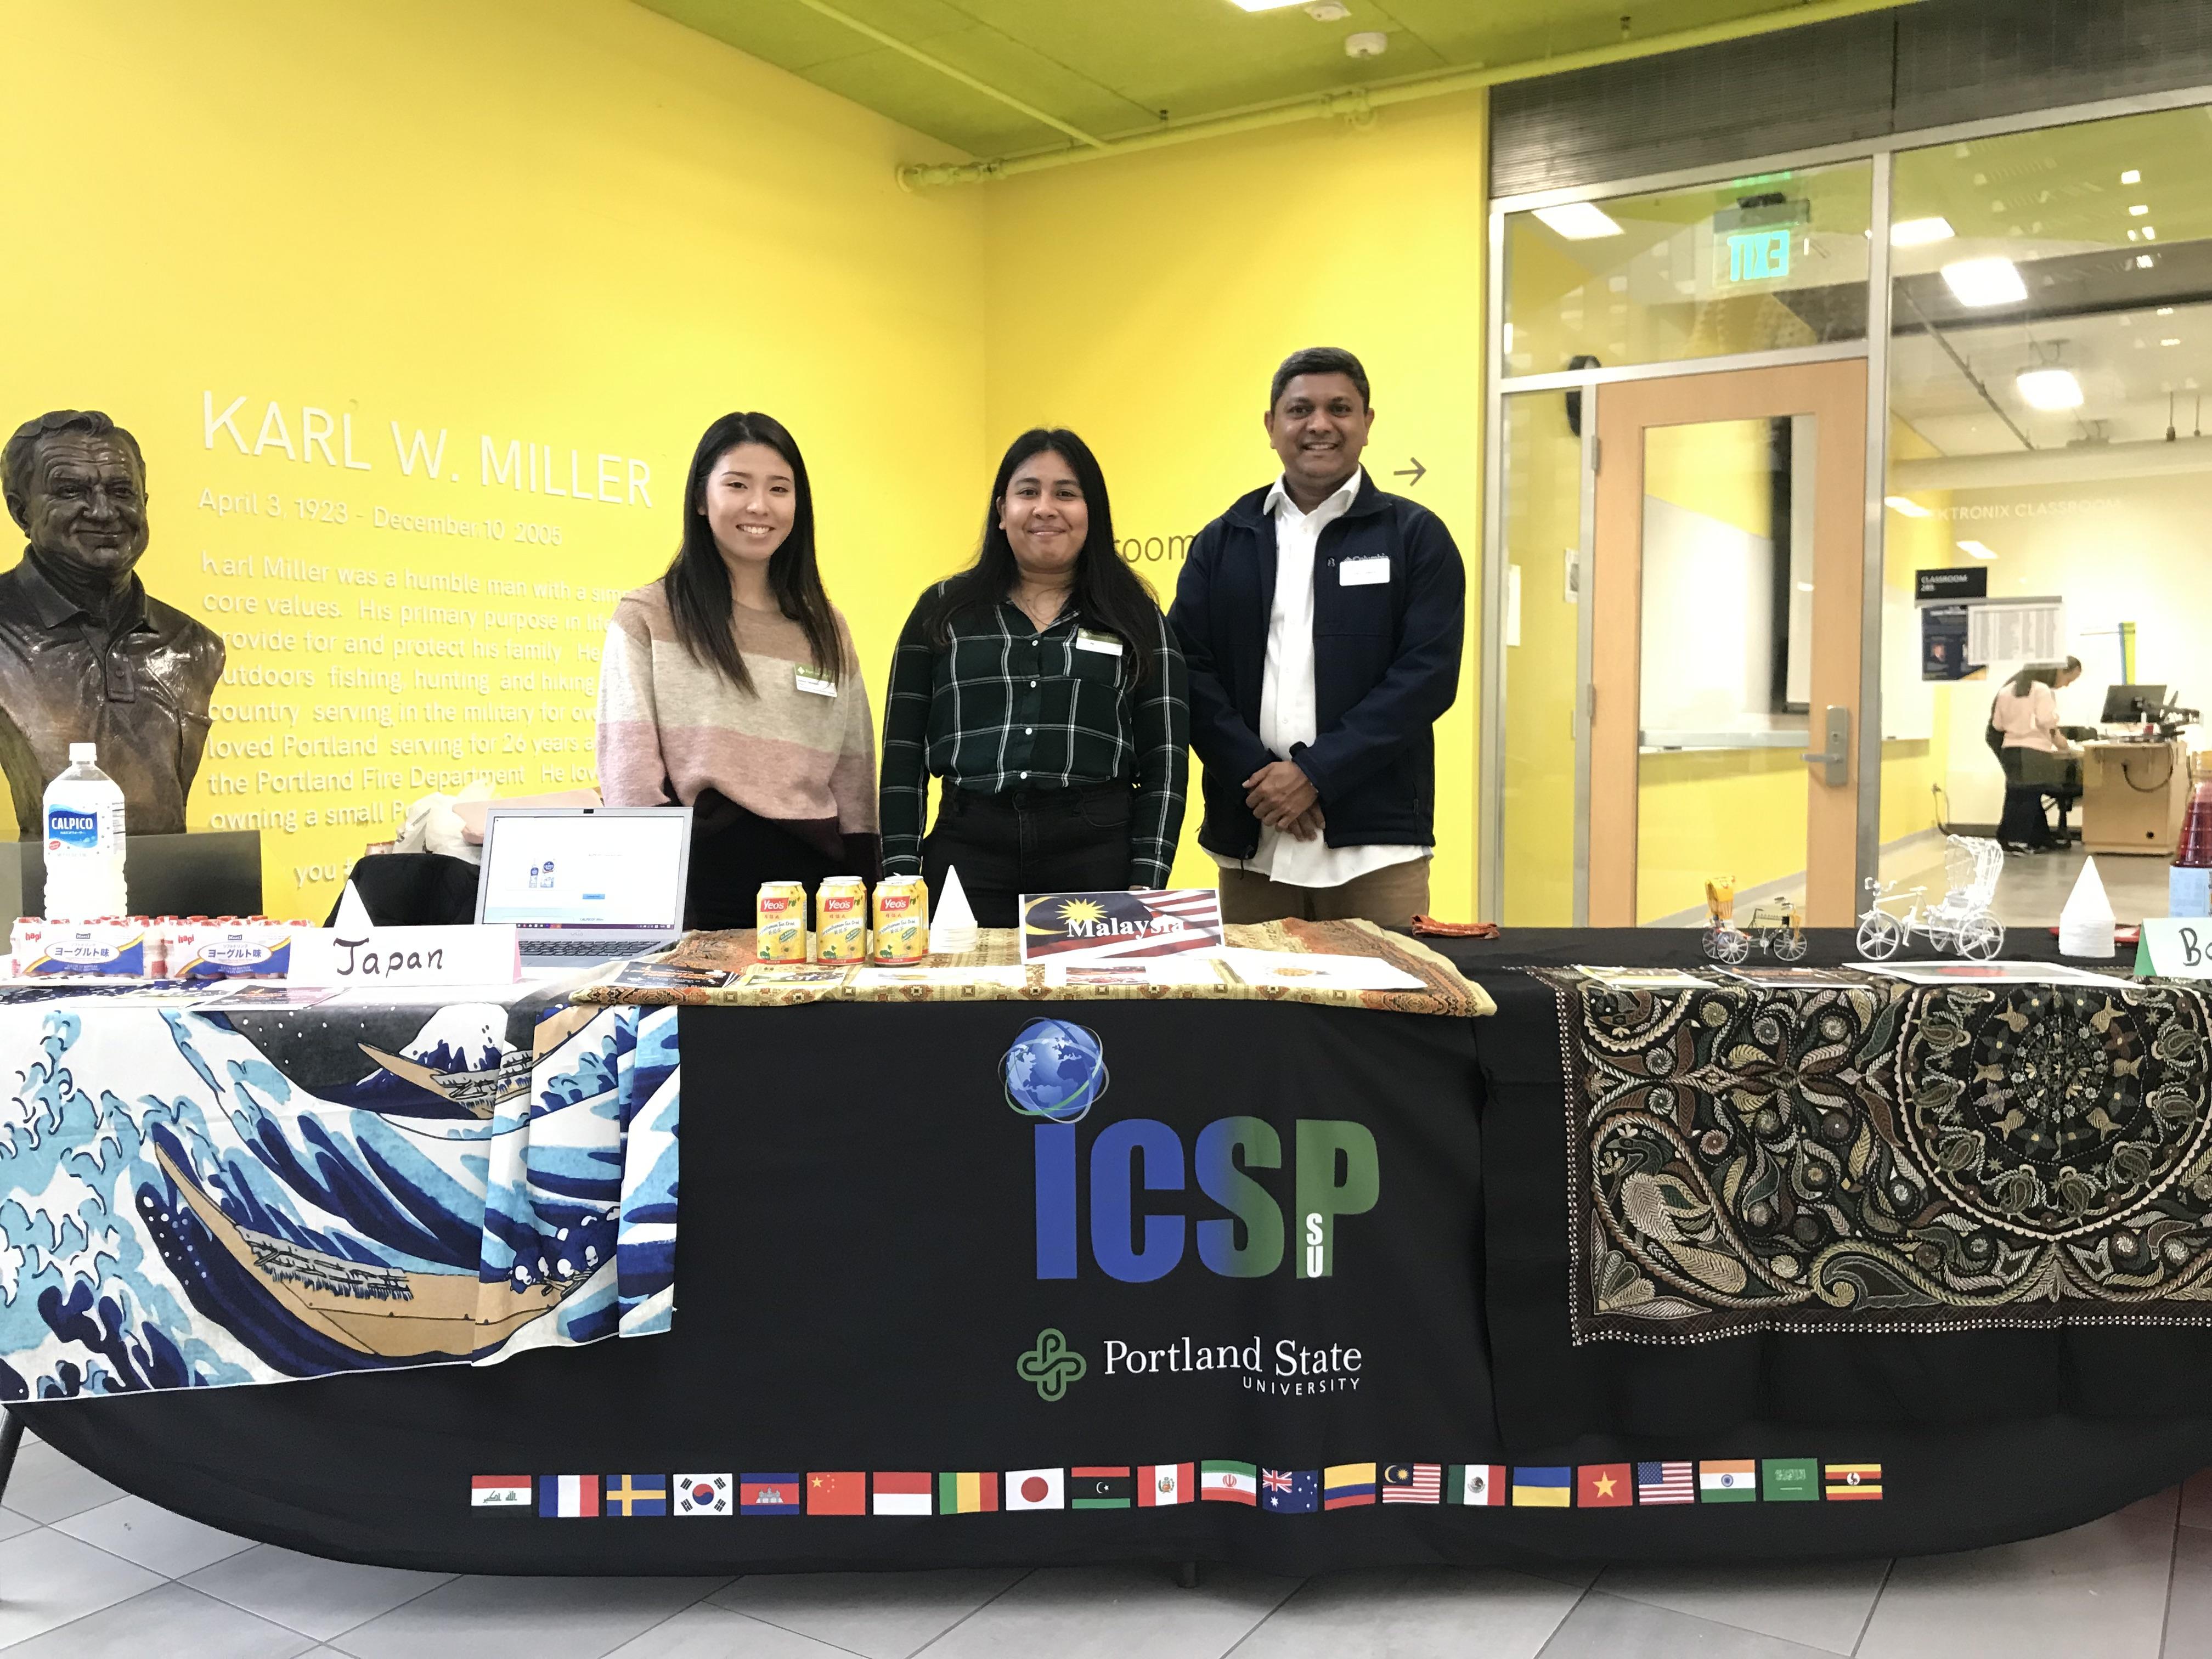 ICSP Beverage Booth